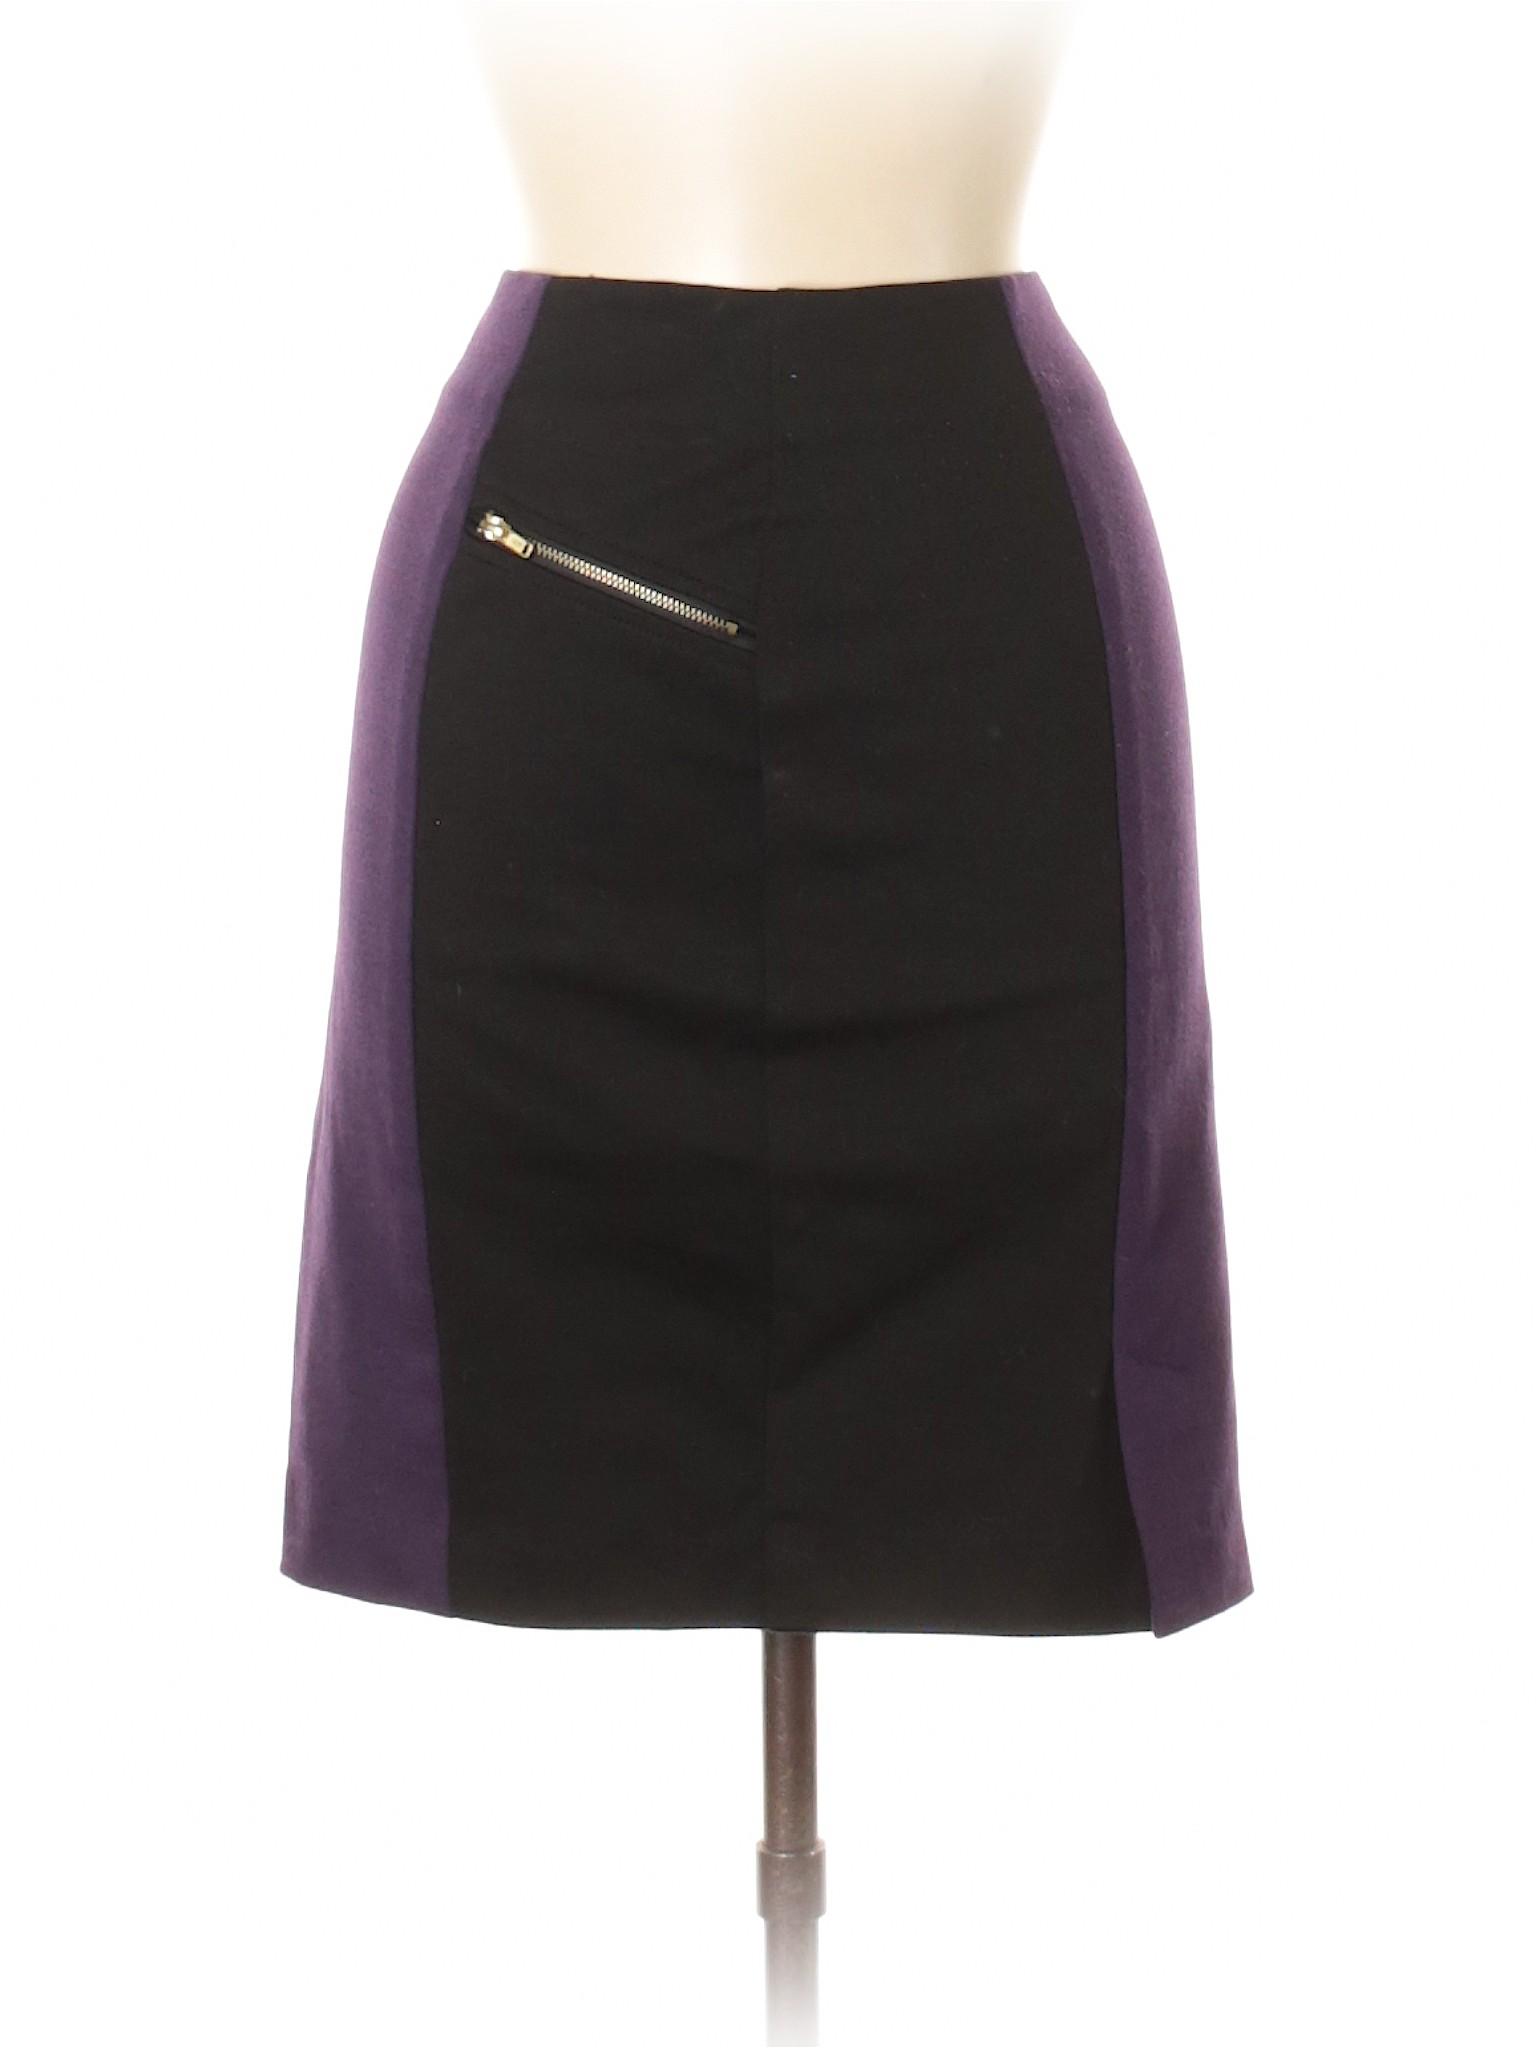 Boutique Casual Boutique Skirt Skirt Casual Boutique Skirt Boutique Casual Fqw7rxaUF